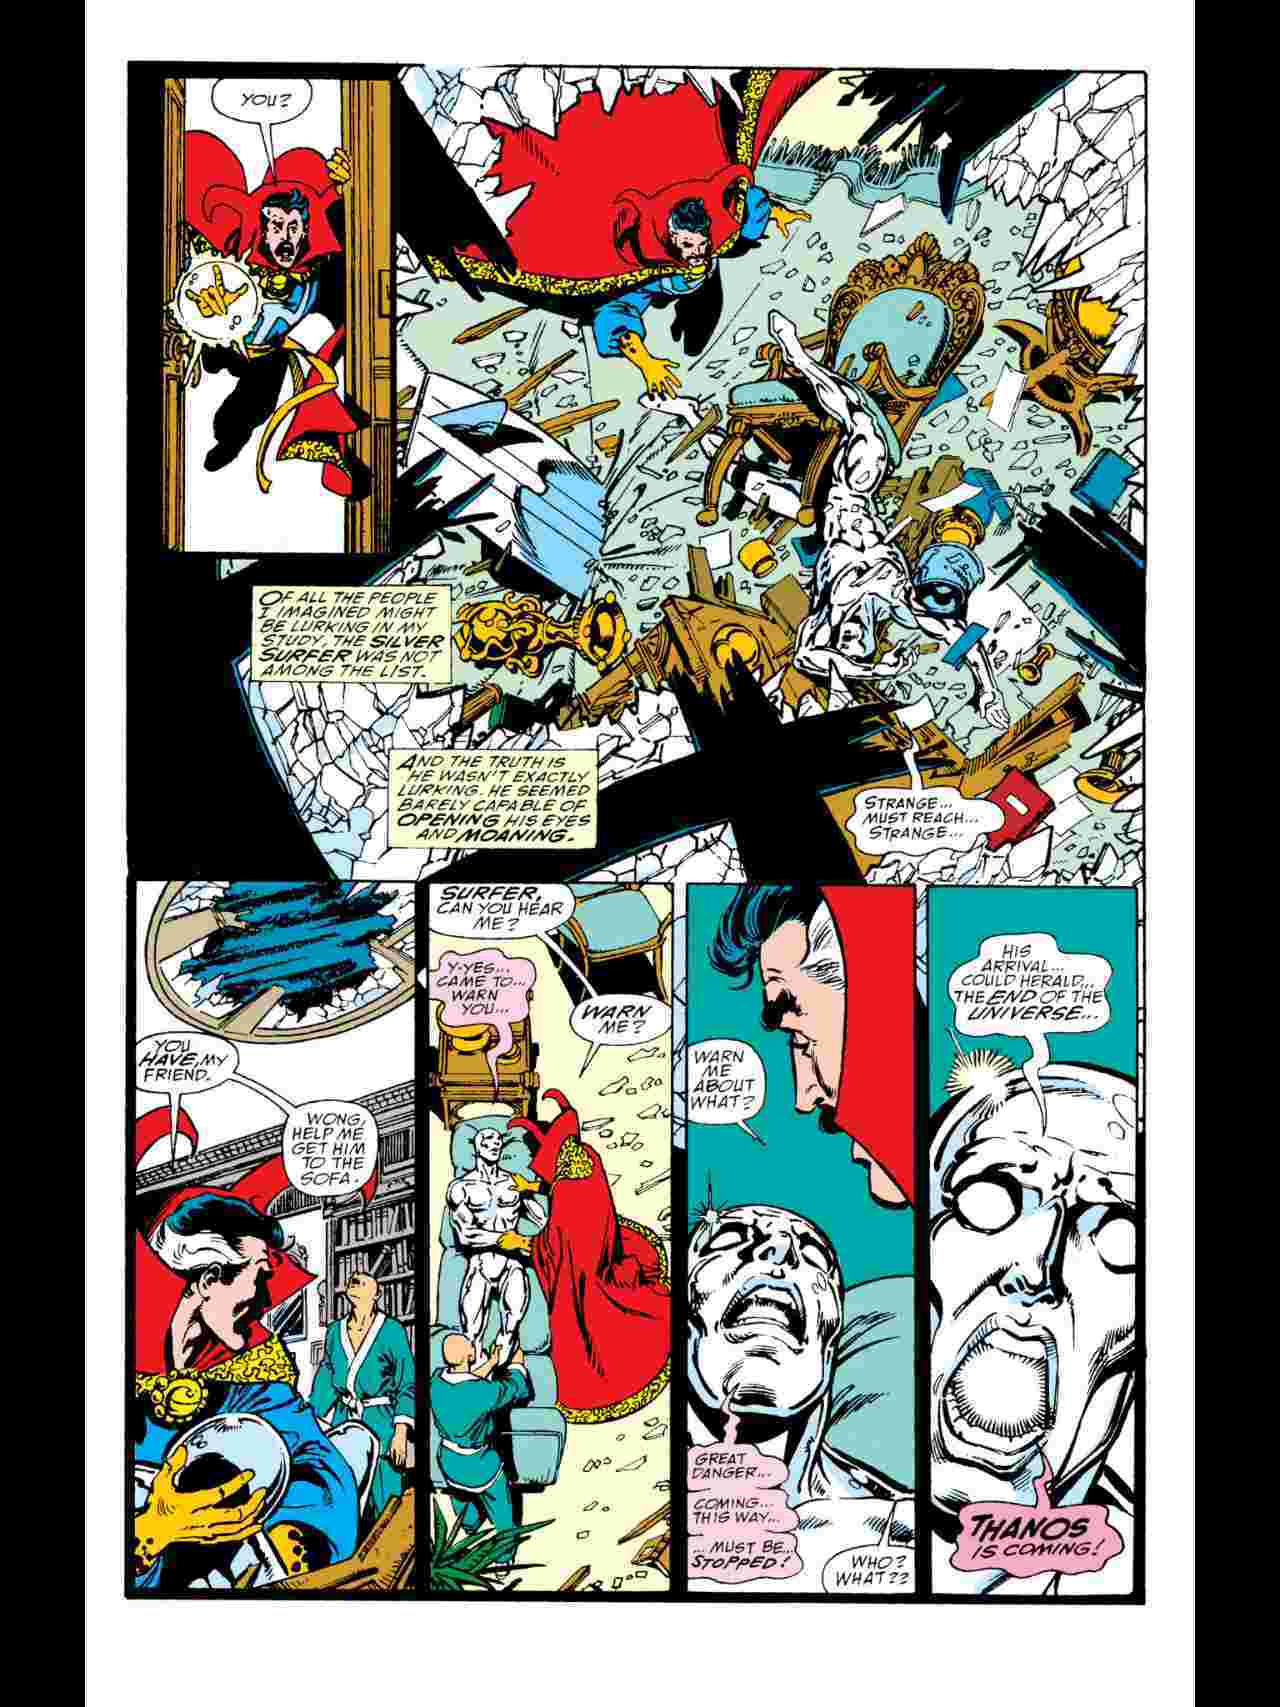 [Lo que se viene] Avengers: Infinity War - Página 3 Infinity-gauntlet-silver-surfer-doctor-strange-1096338